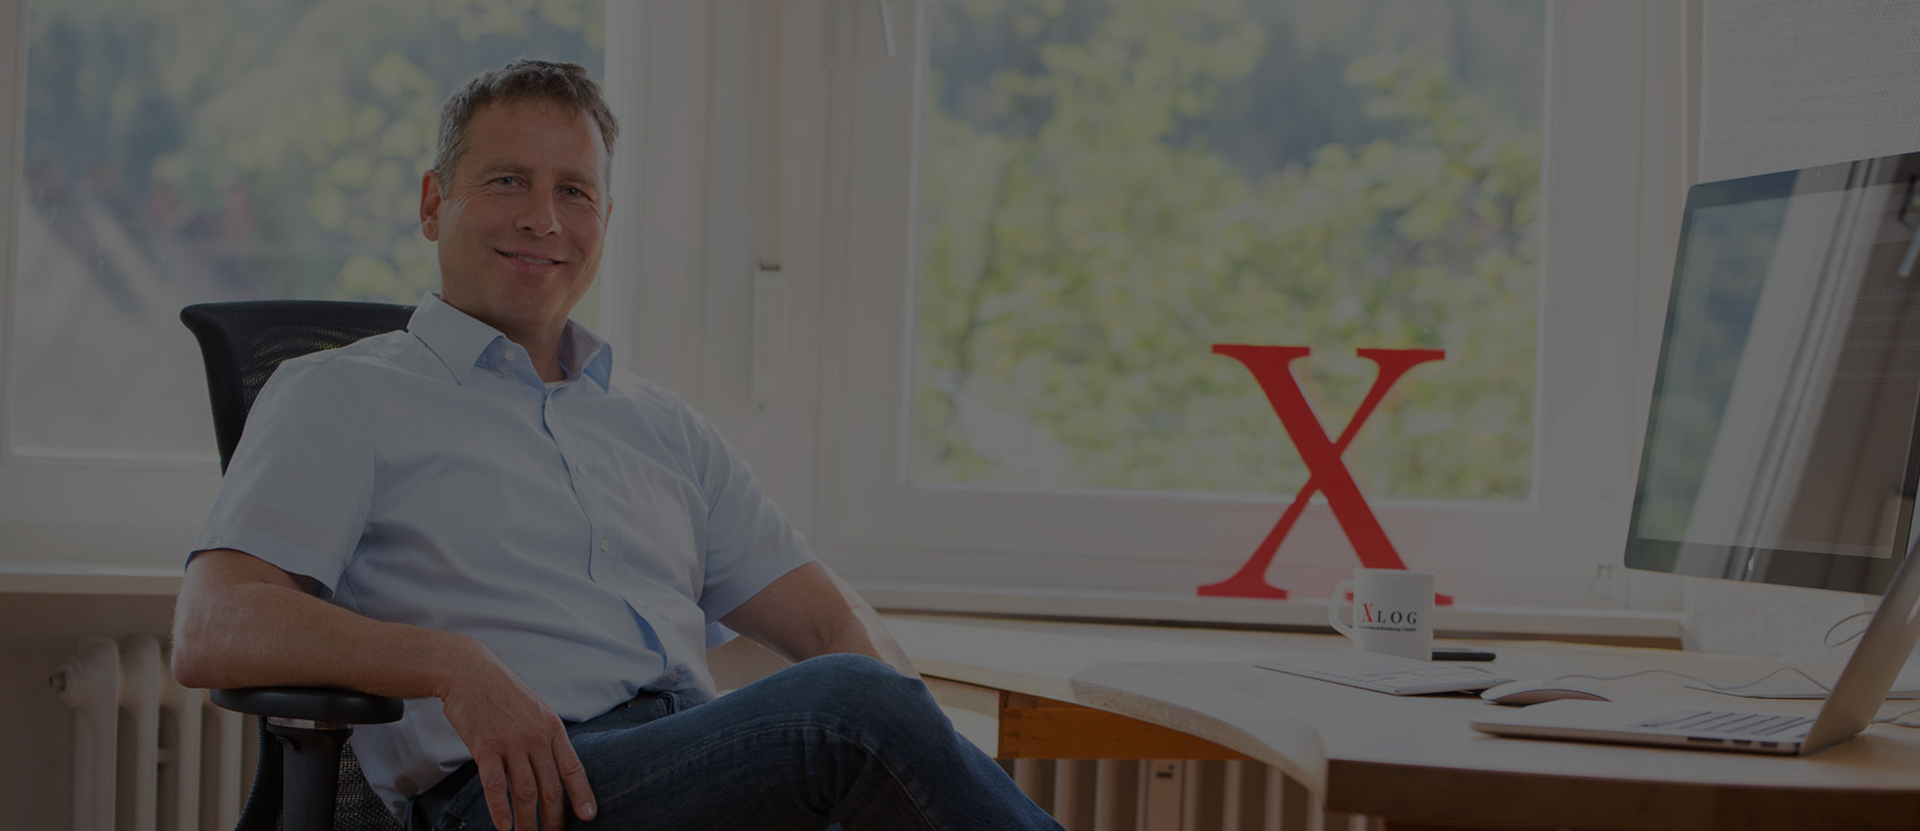 iXlog-Unternehmensberatung-header-sap-s4-hana